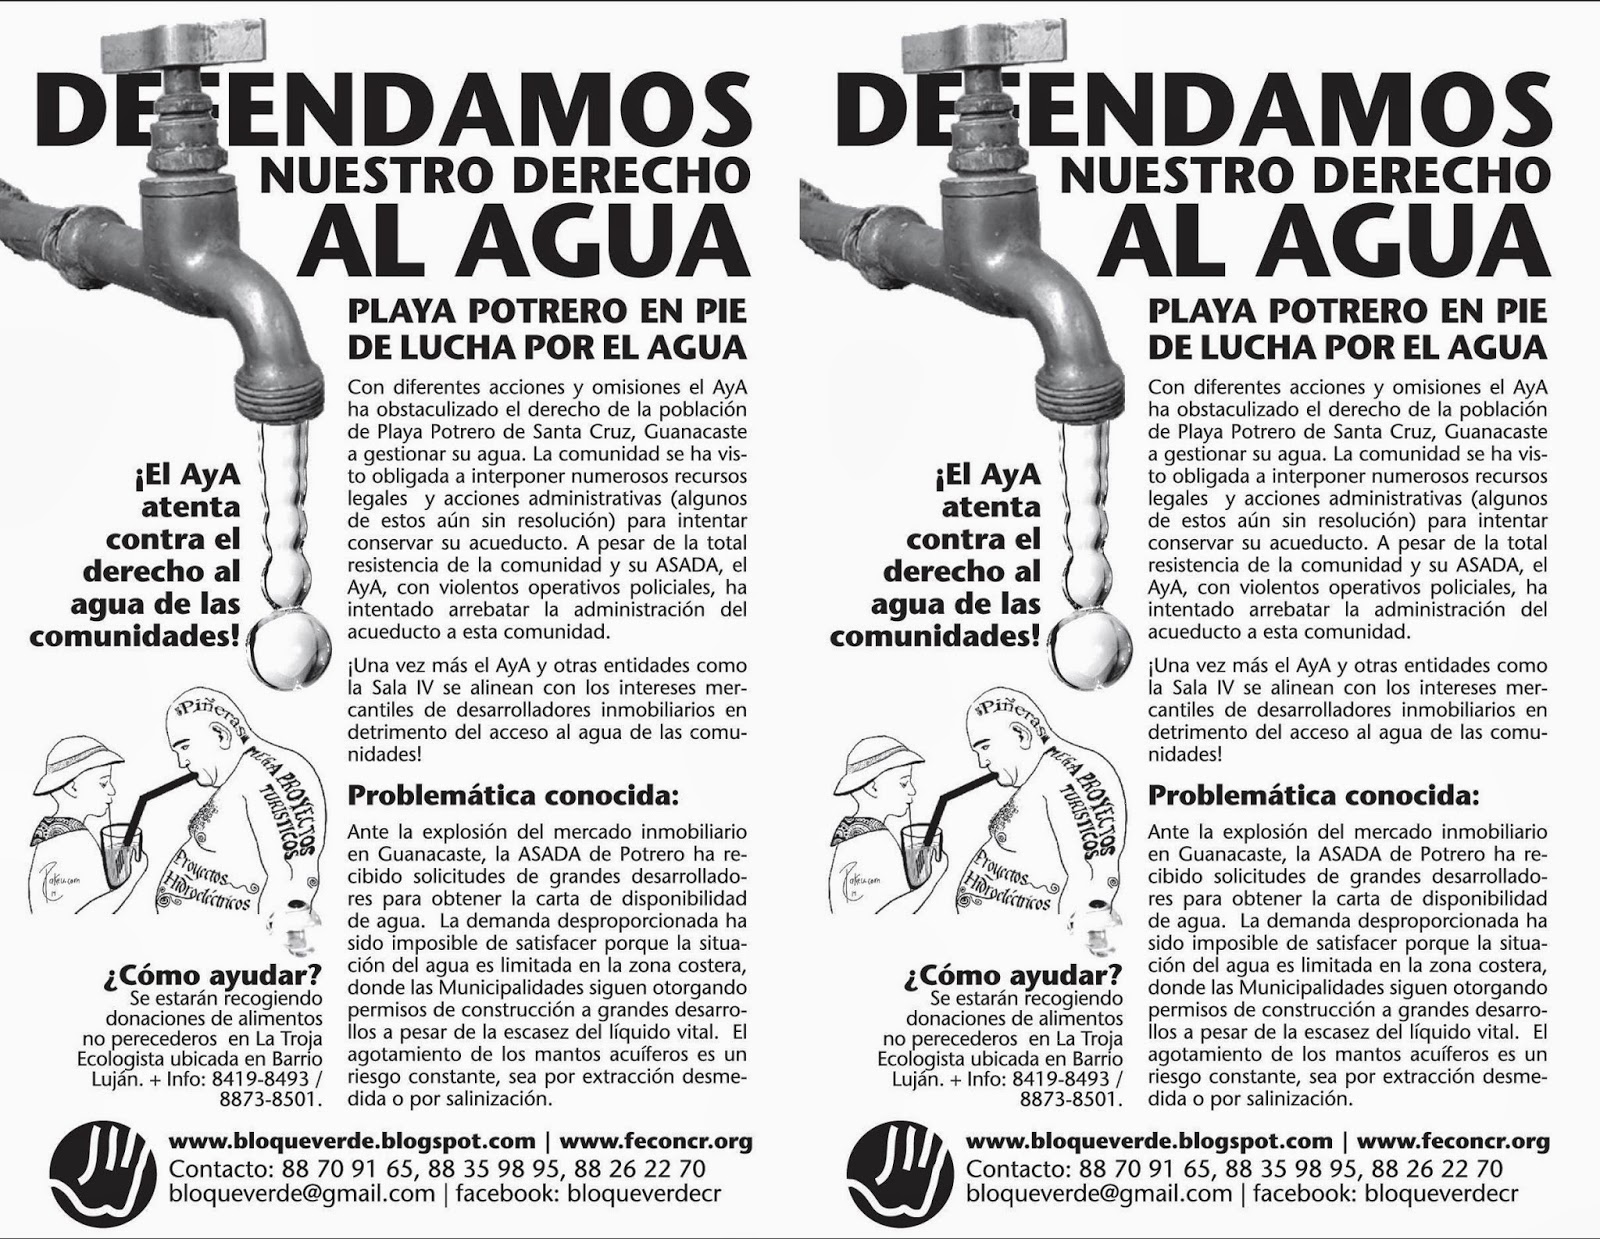 http://feconcr.org/doc/agua/playapotrero1out.pdf